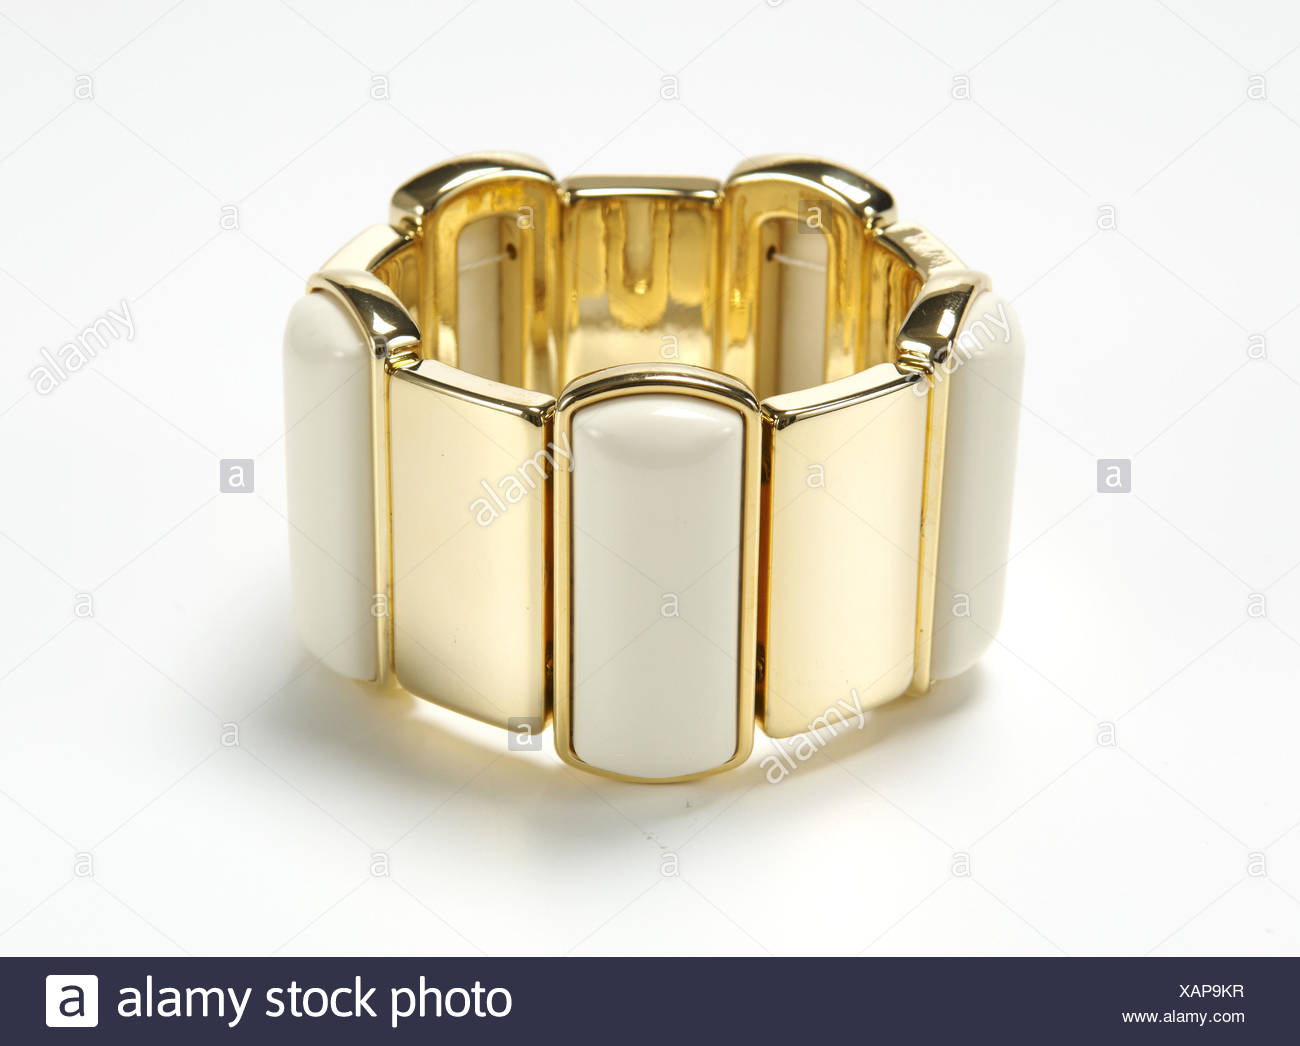 Bangle, - Stock Image